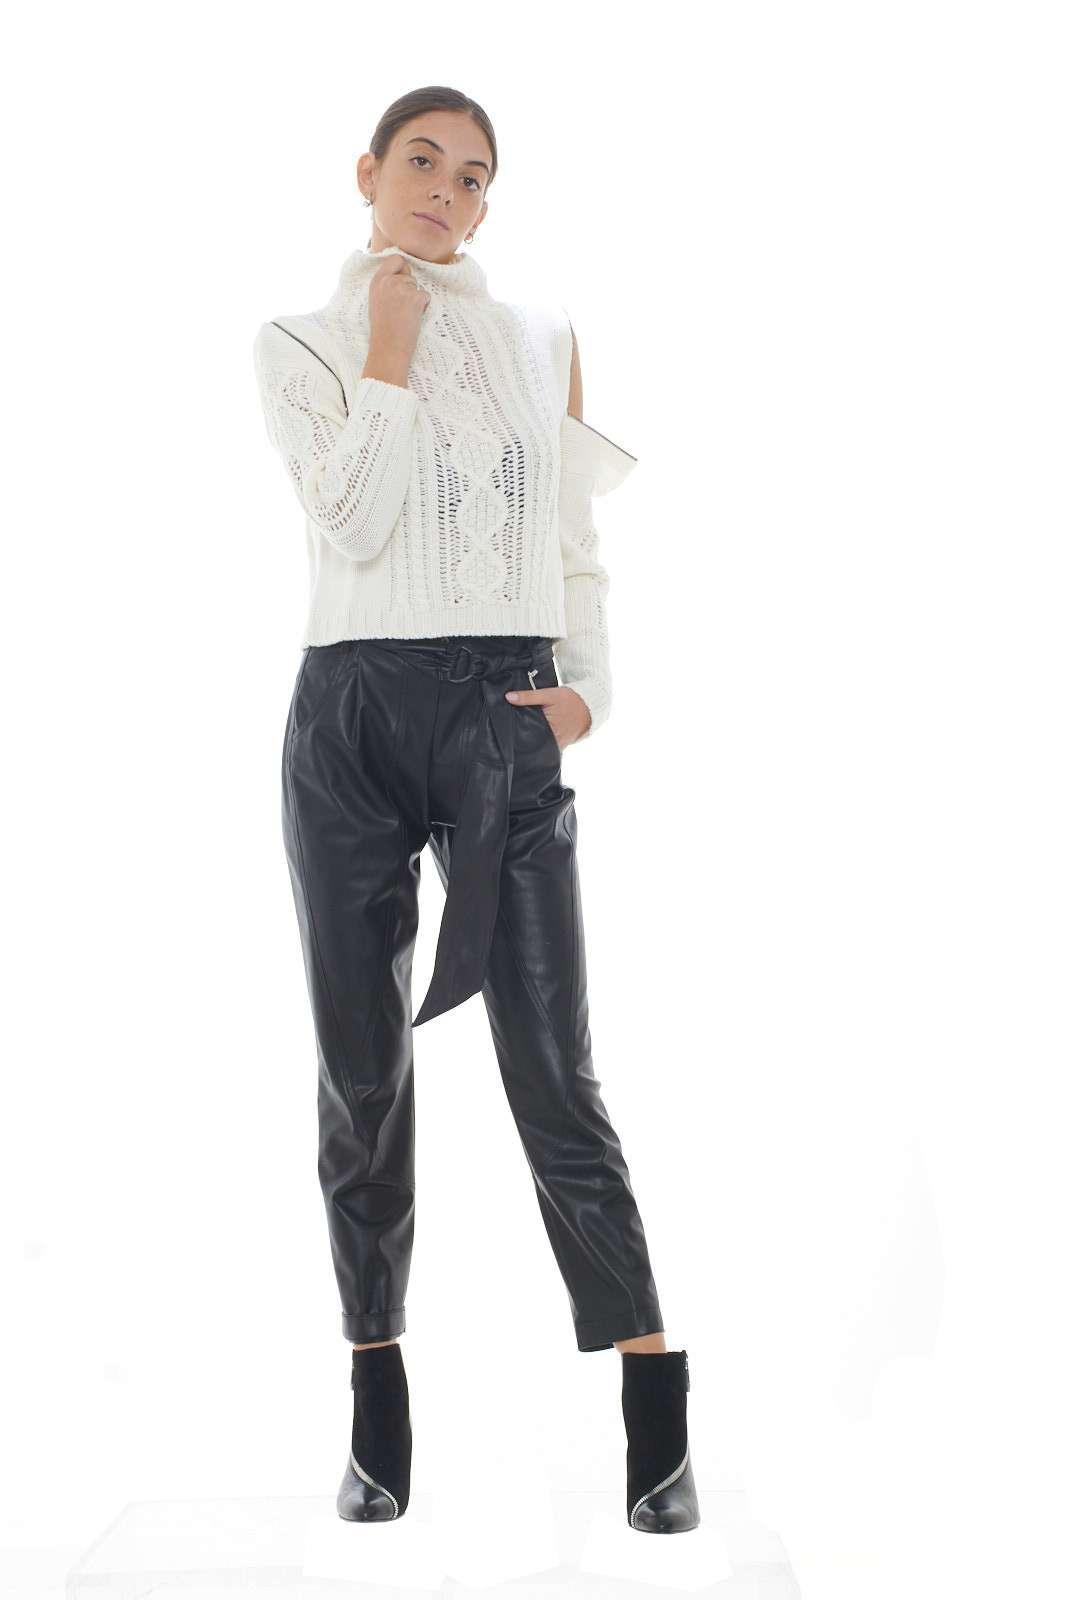 https://www.parmax.com/media/catalog/product/a/i/AI-outlet_parmax-maglia-donna-Patrizia-Pepe-8m0866-D.jpg